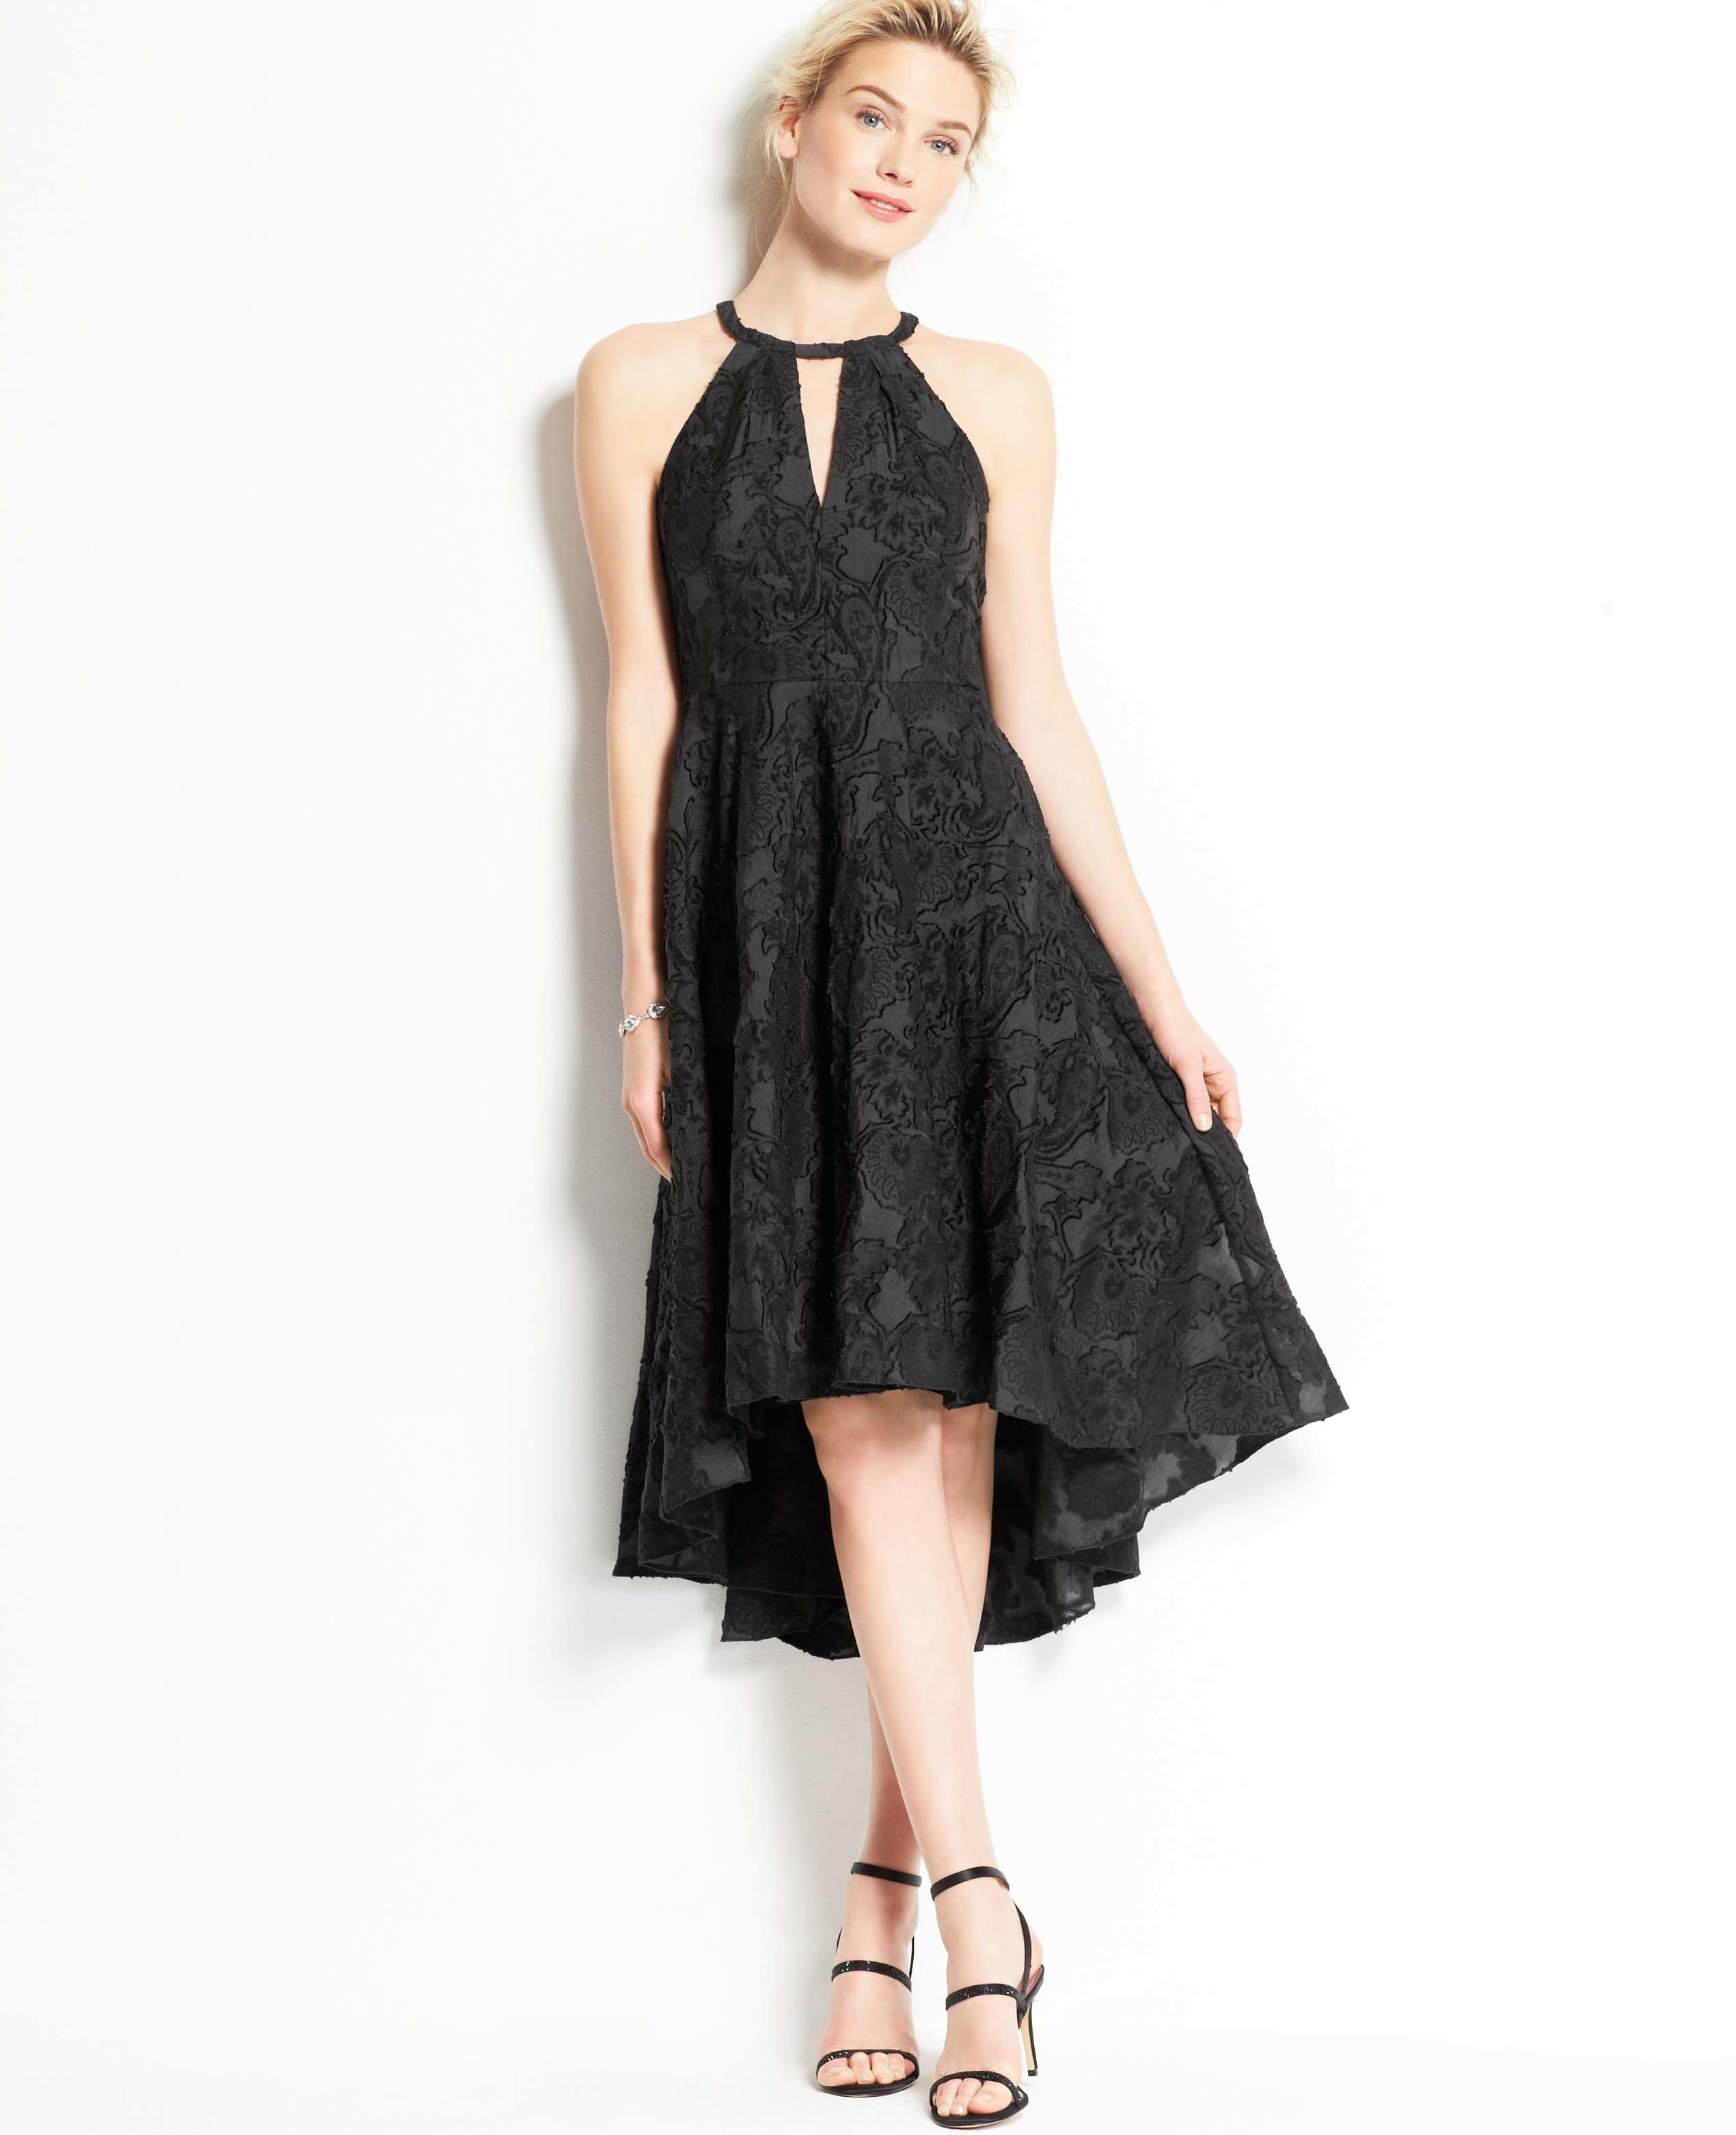 Black High Low Halter Dress,High Low Petite Dresses,